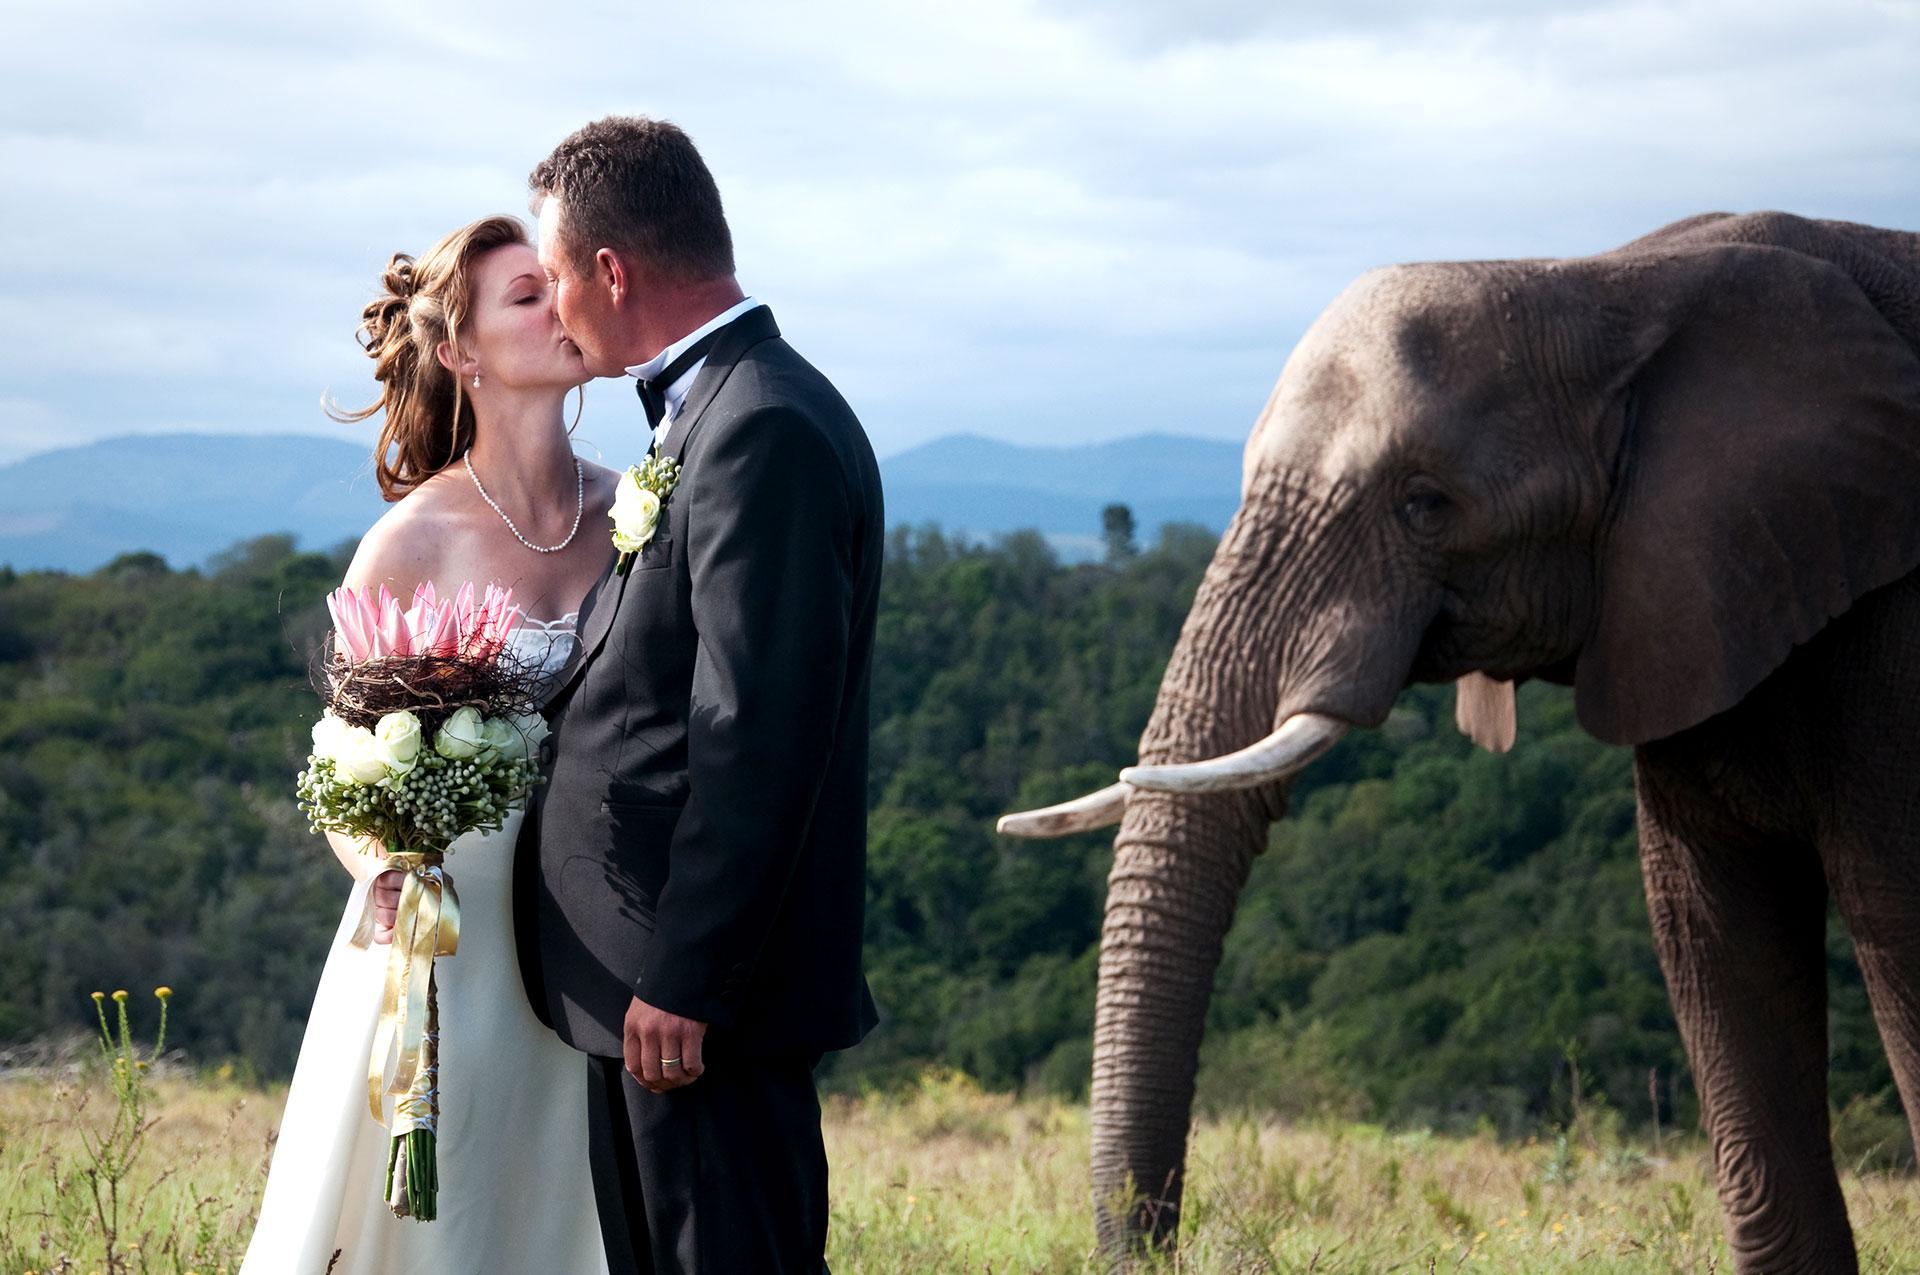 KEP_20051026_WEDDING_PICS_GN_219